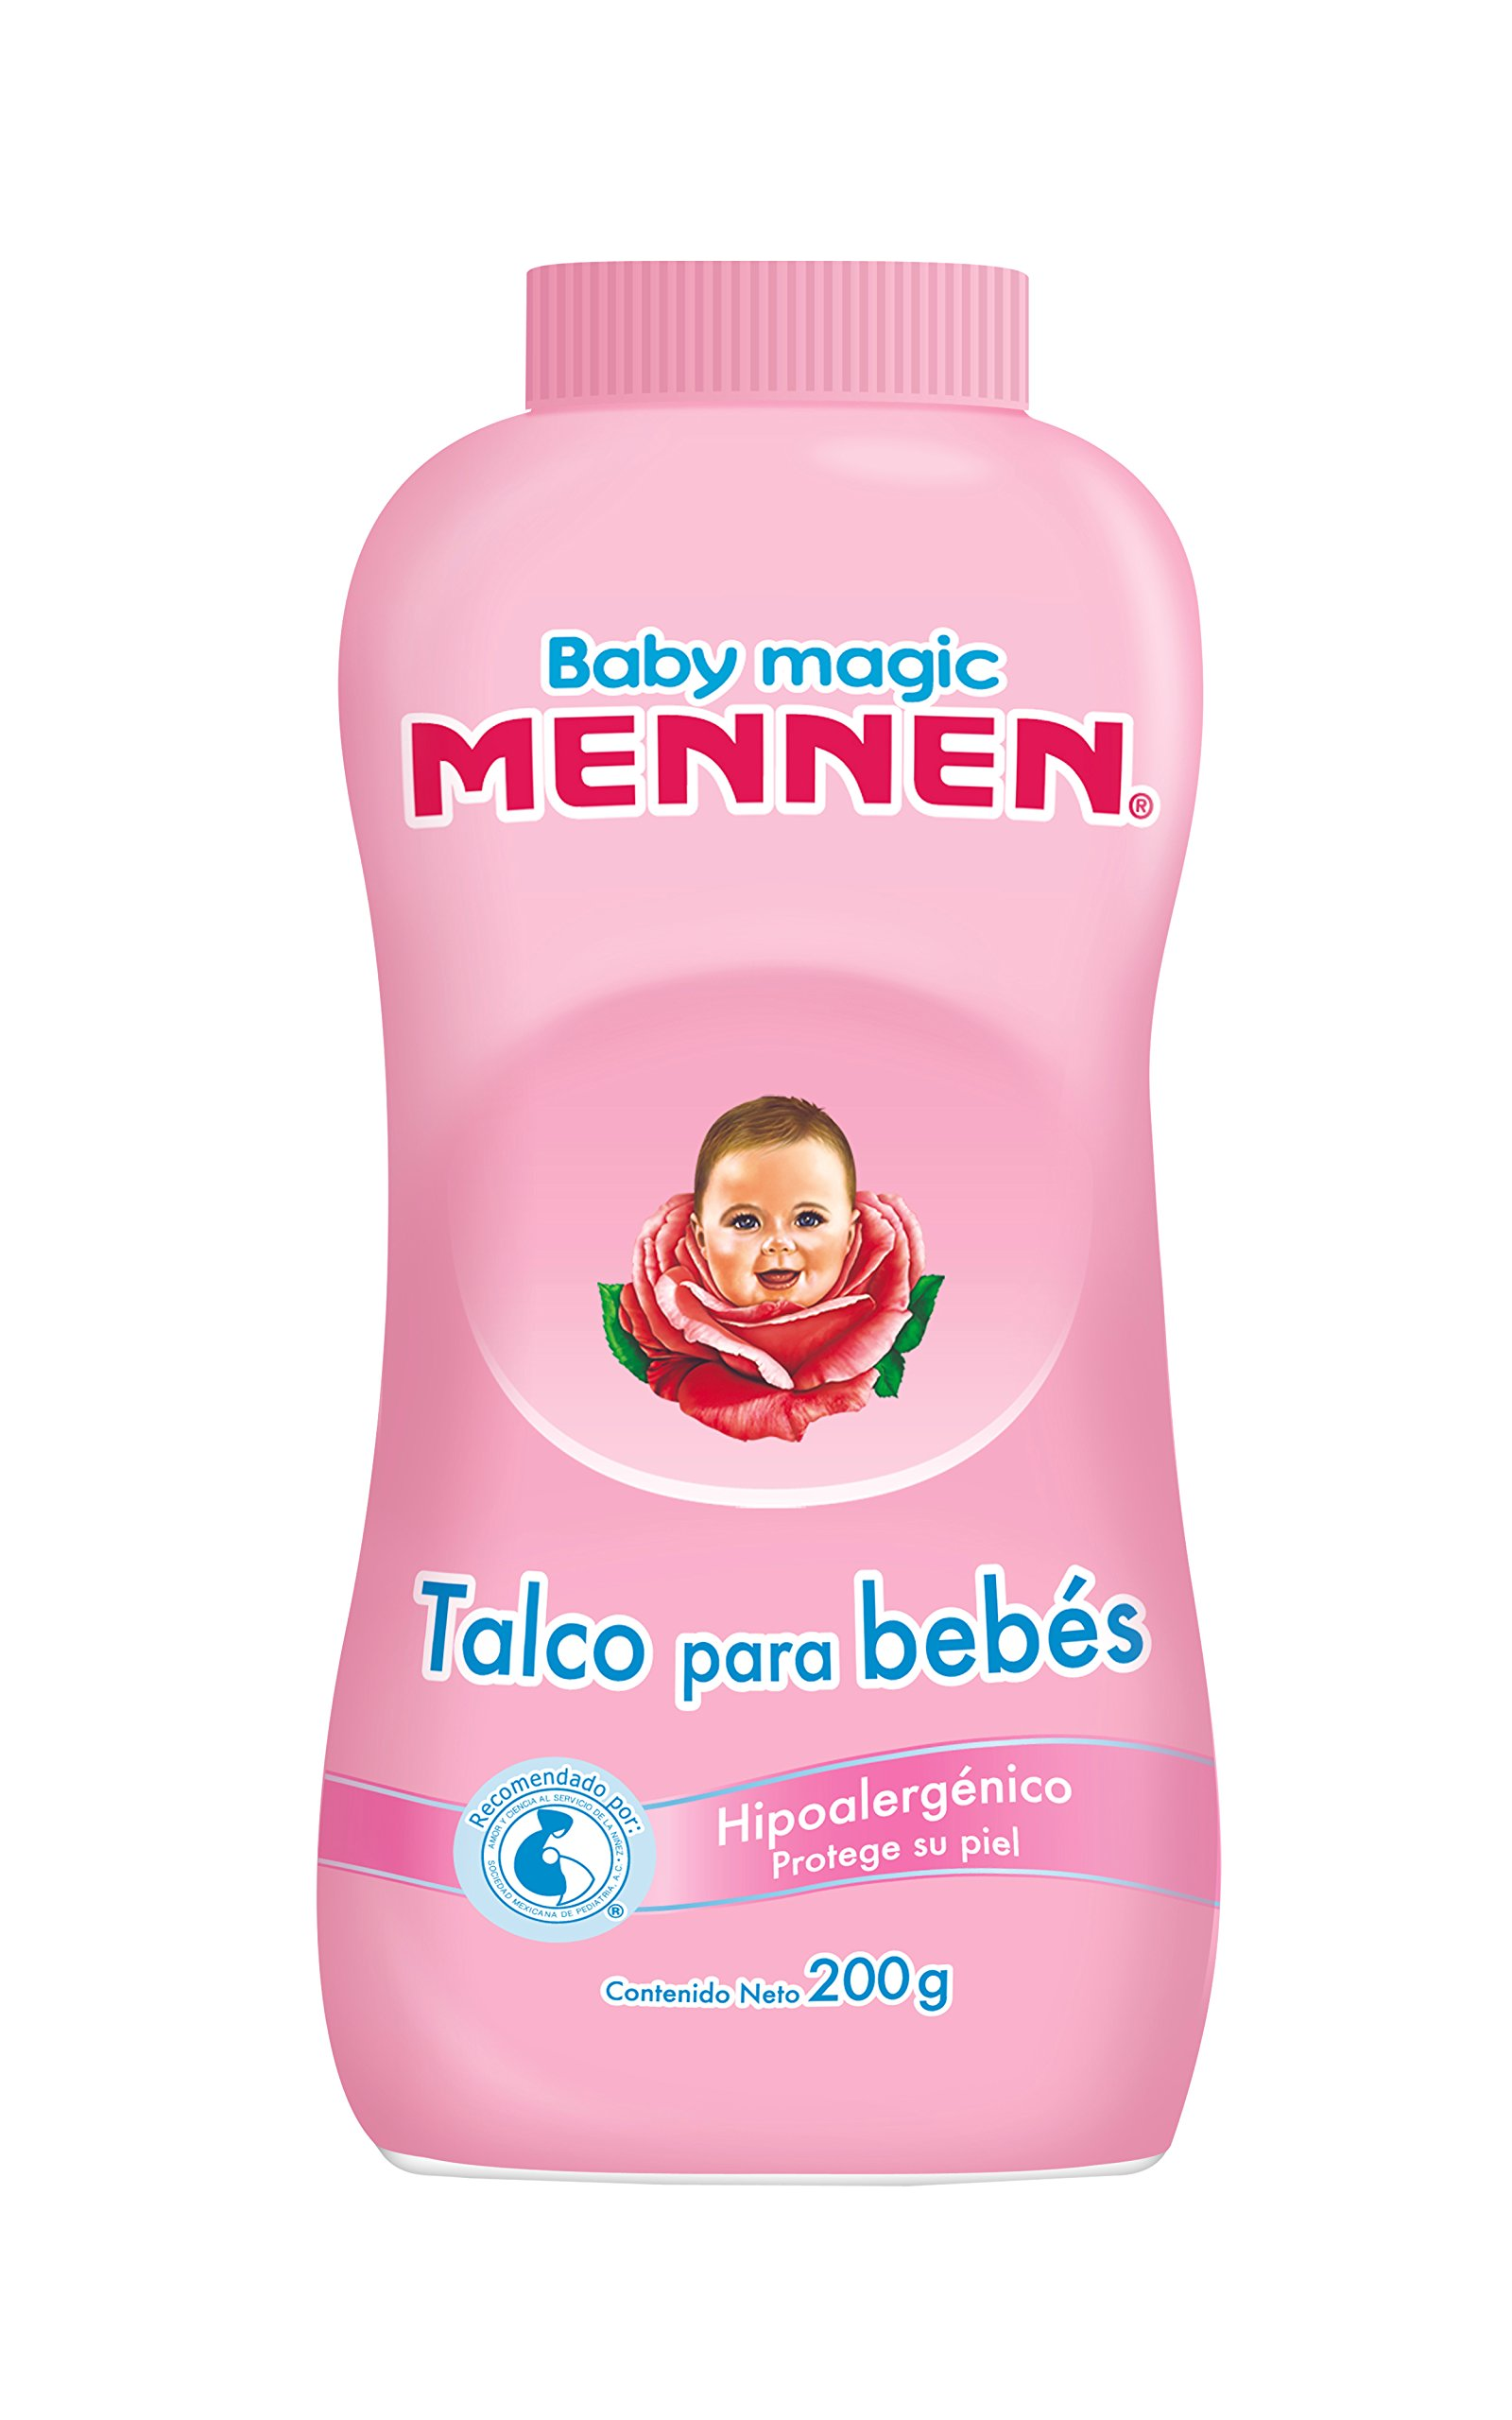 Amazon.com: Mennen Baby Magic Powder 7.05oz / Talco Para Bebe: Health & Personal Care